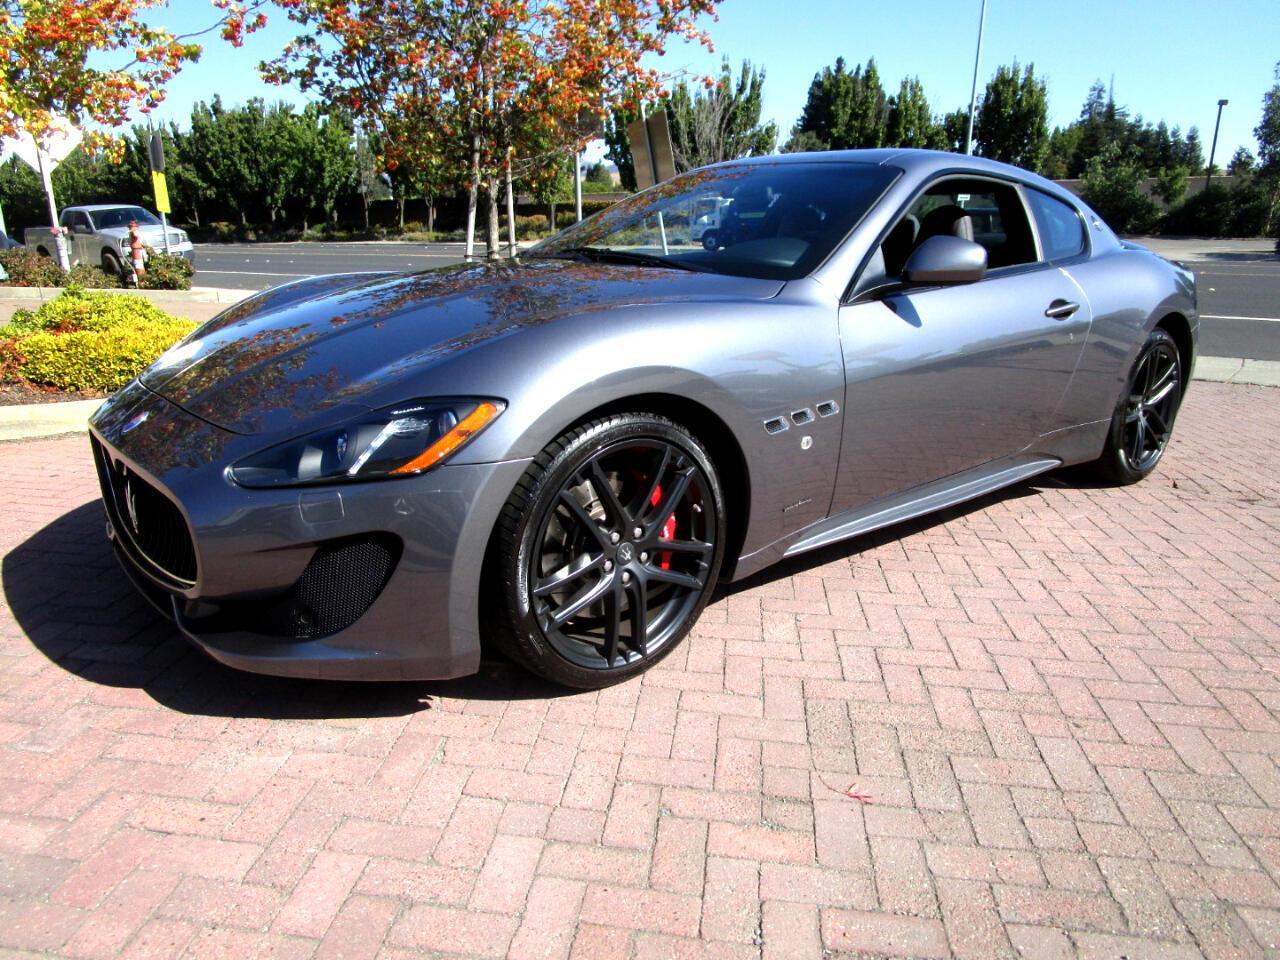 2016 Maserati GranTurismo 2654 MILES**4.7 LITER V8 454HP*LOADED-LIKE NEW**